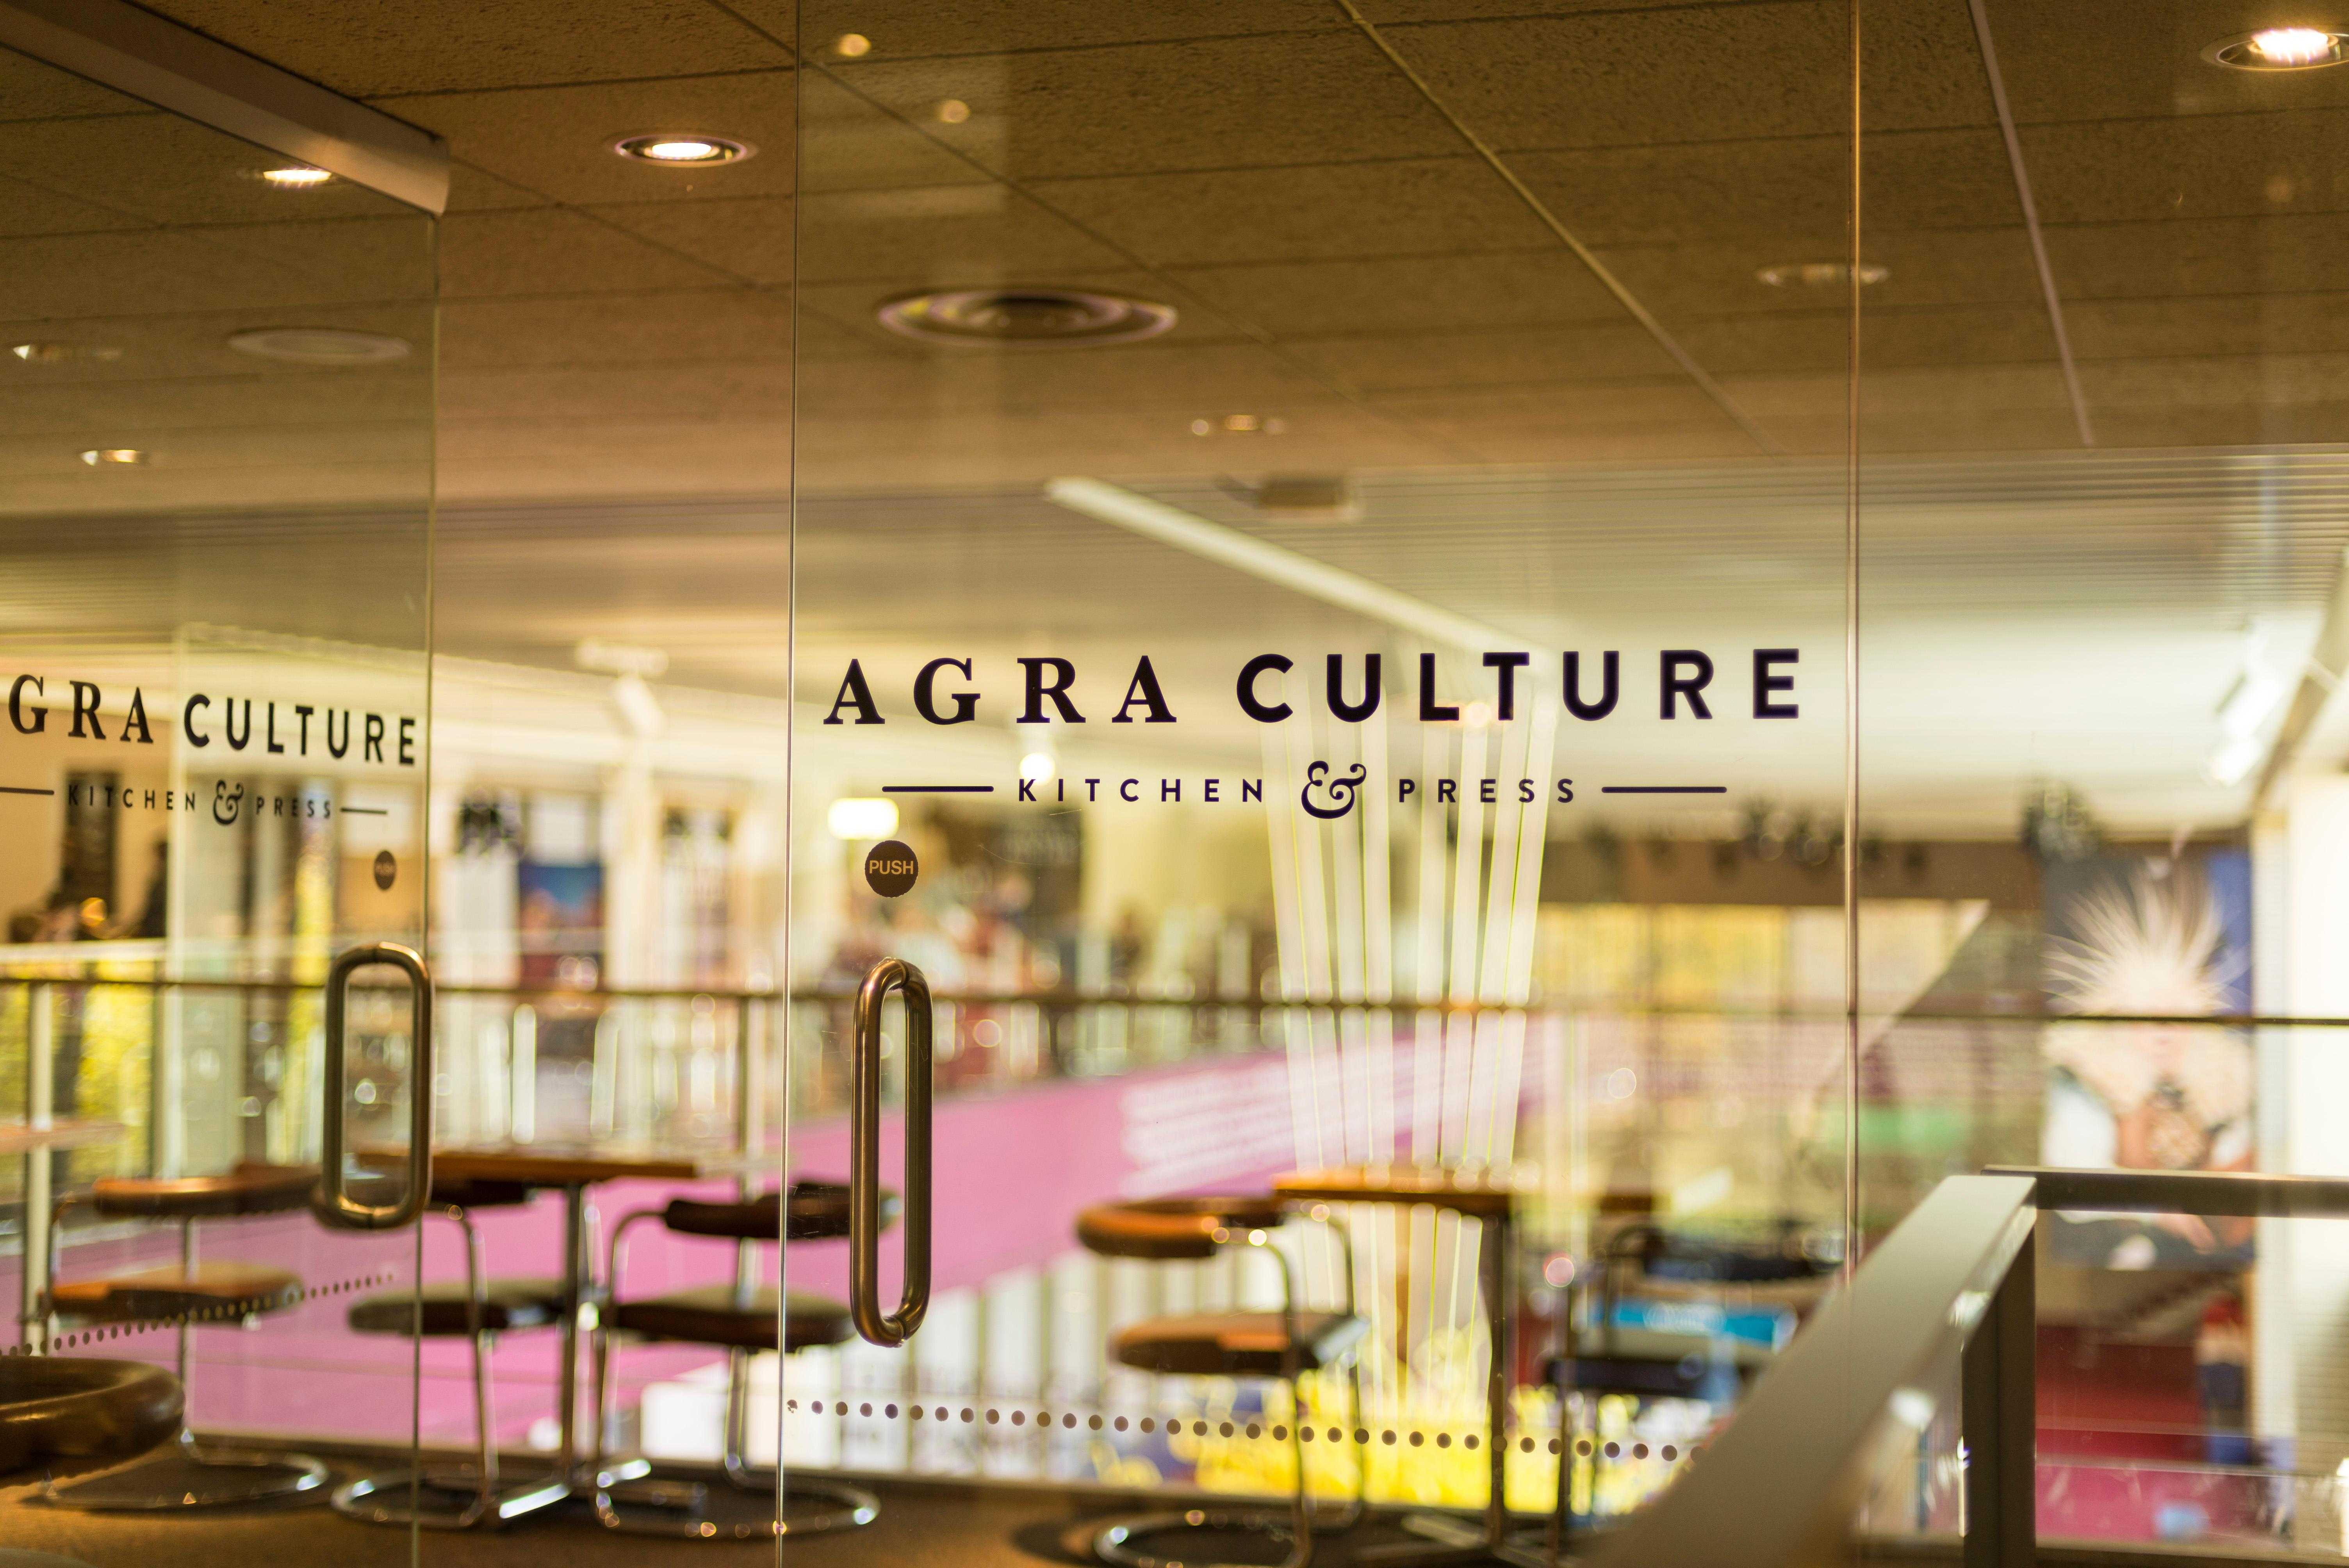 Agra Culture Kitchen Mia ( Minneapolis Institute of Art) image 0